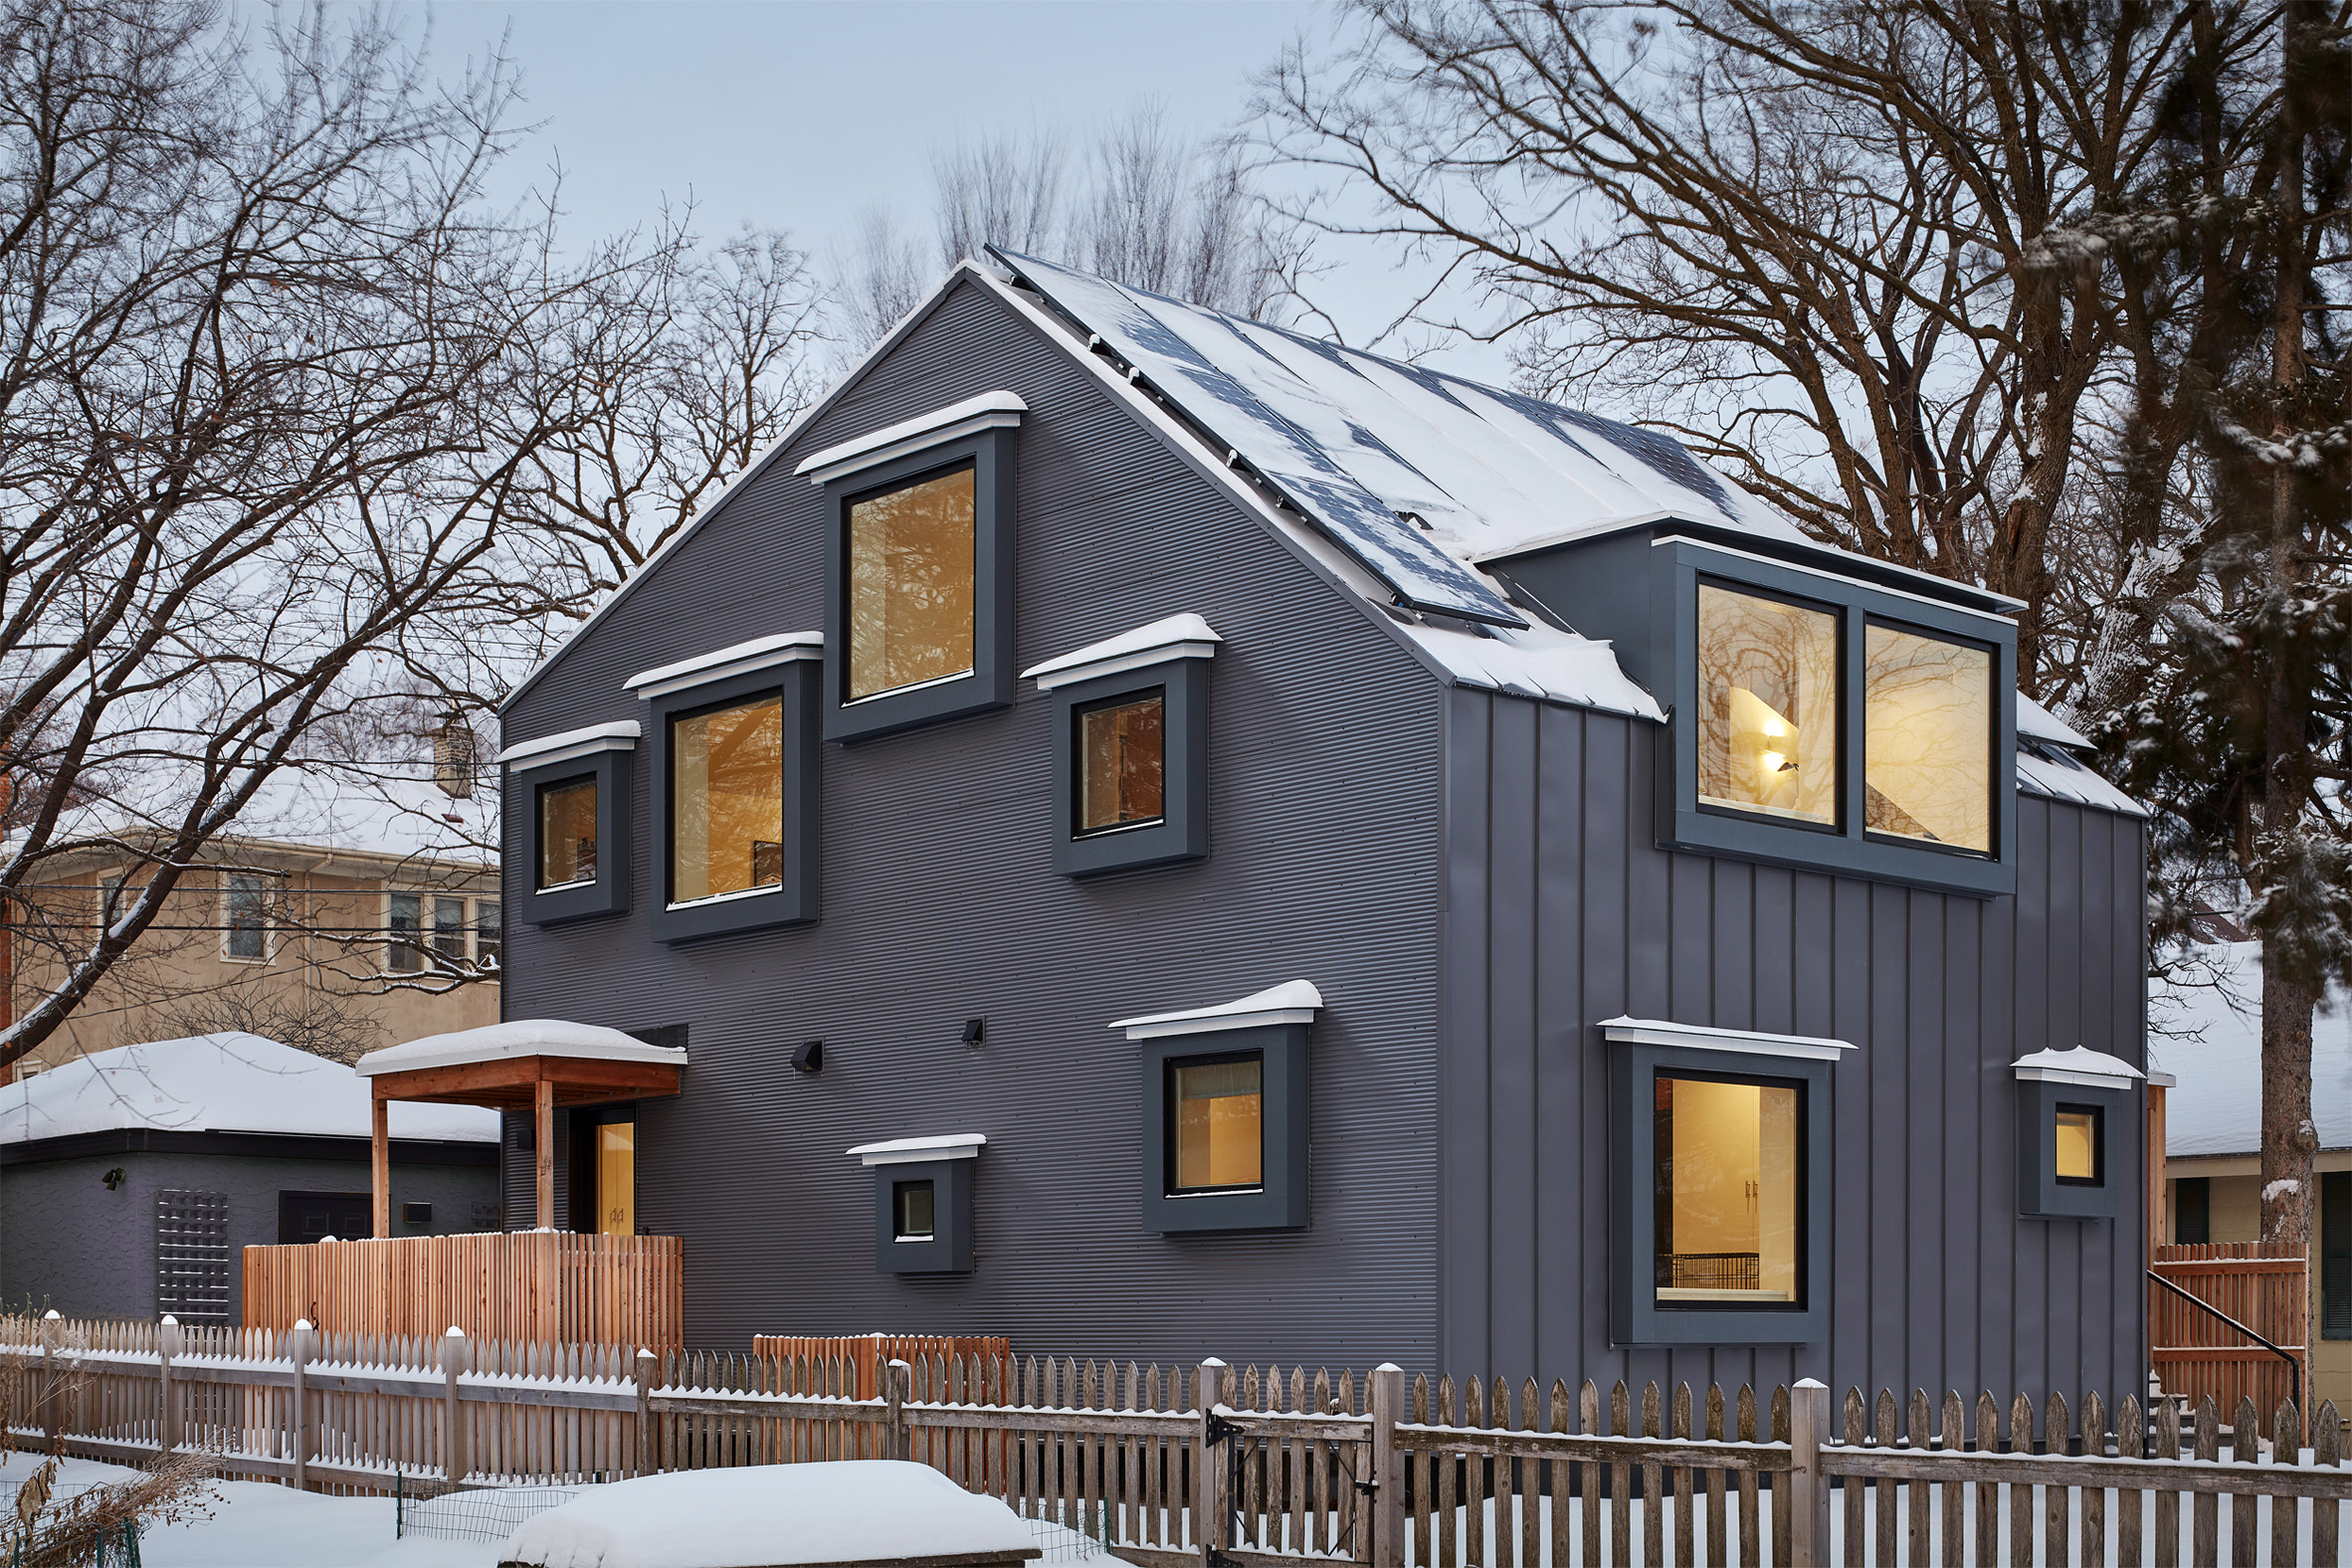 Salmela Architect designed the project